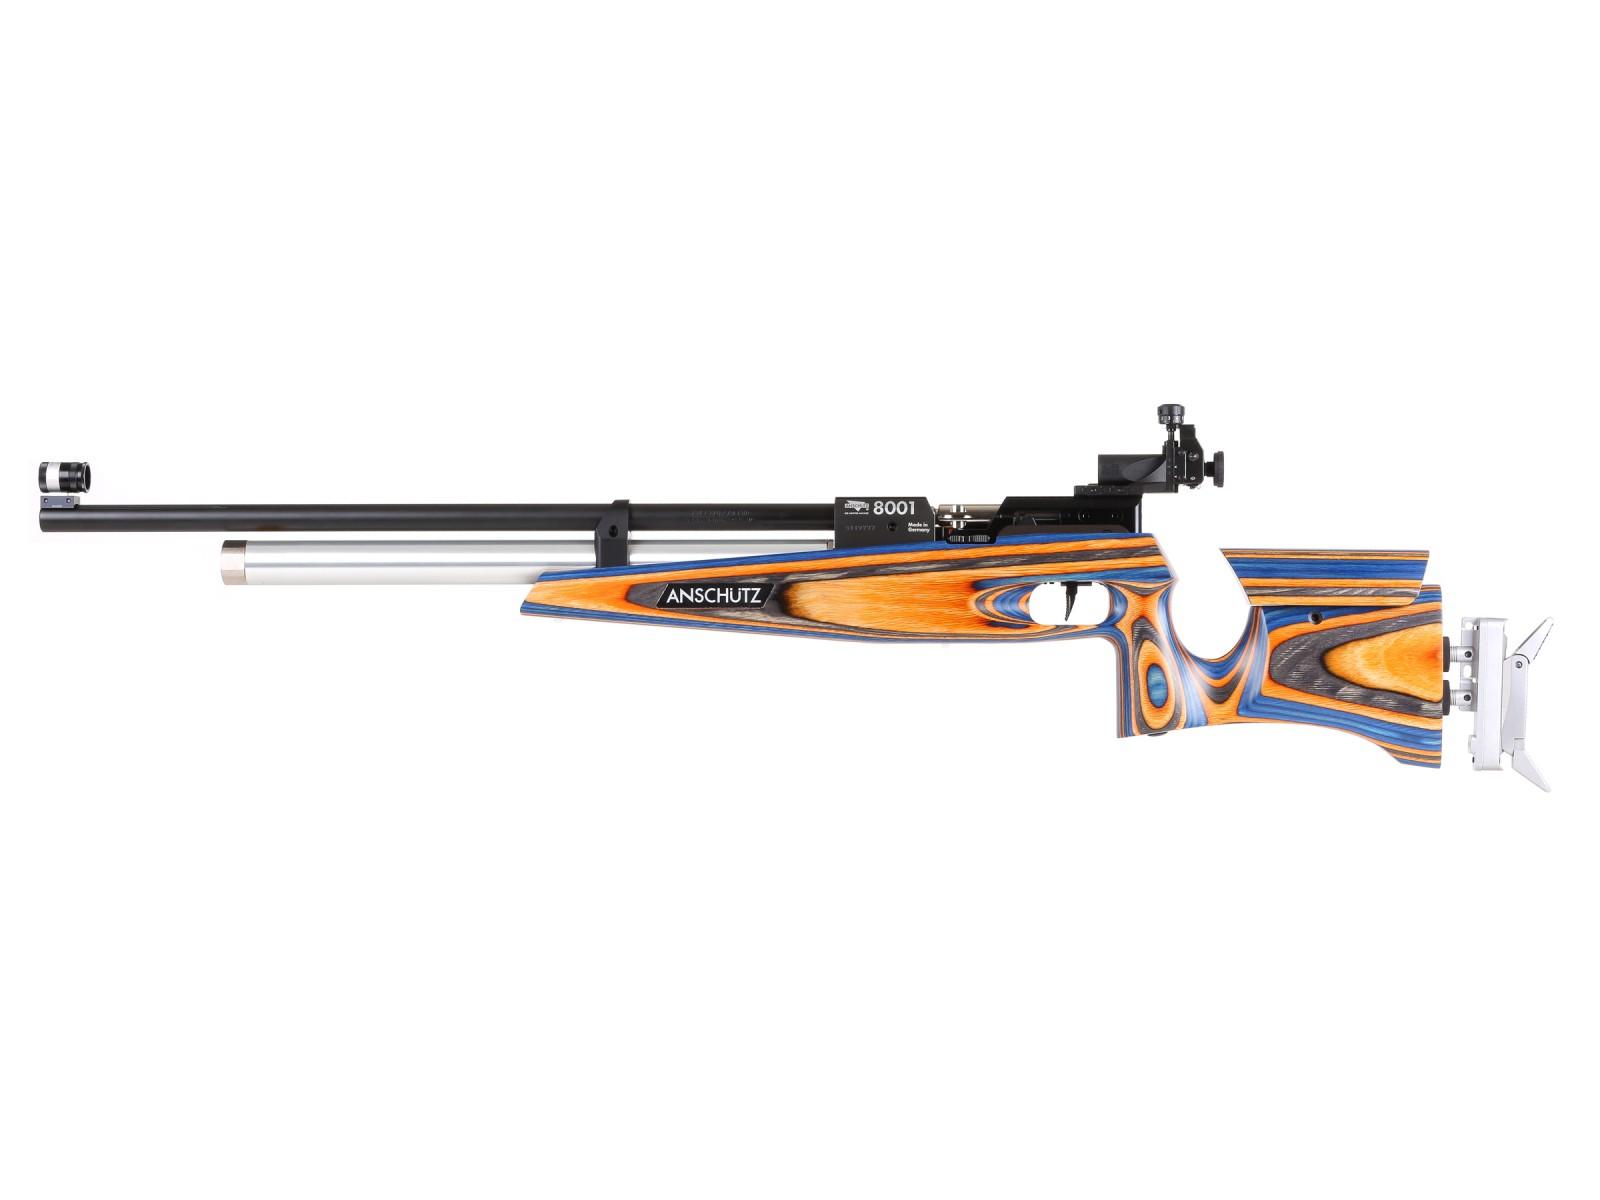 Anschutz 8001 Club Air Rifle - Civilian Marksmanship Prog